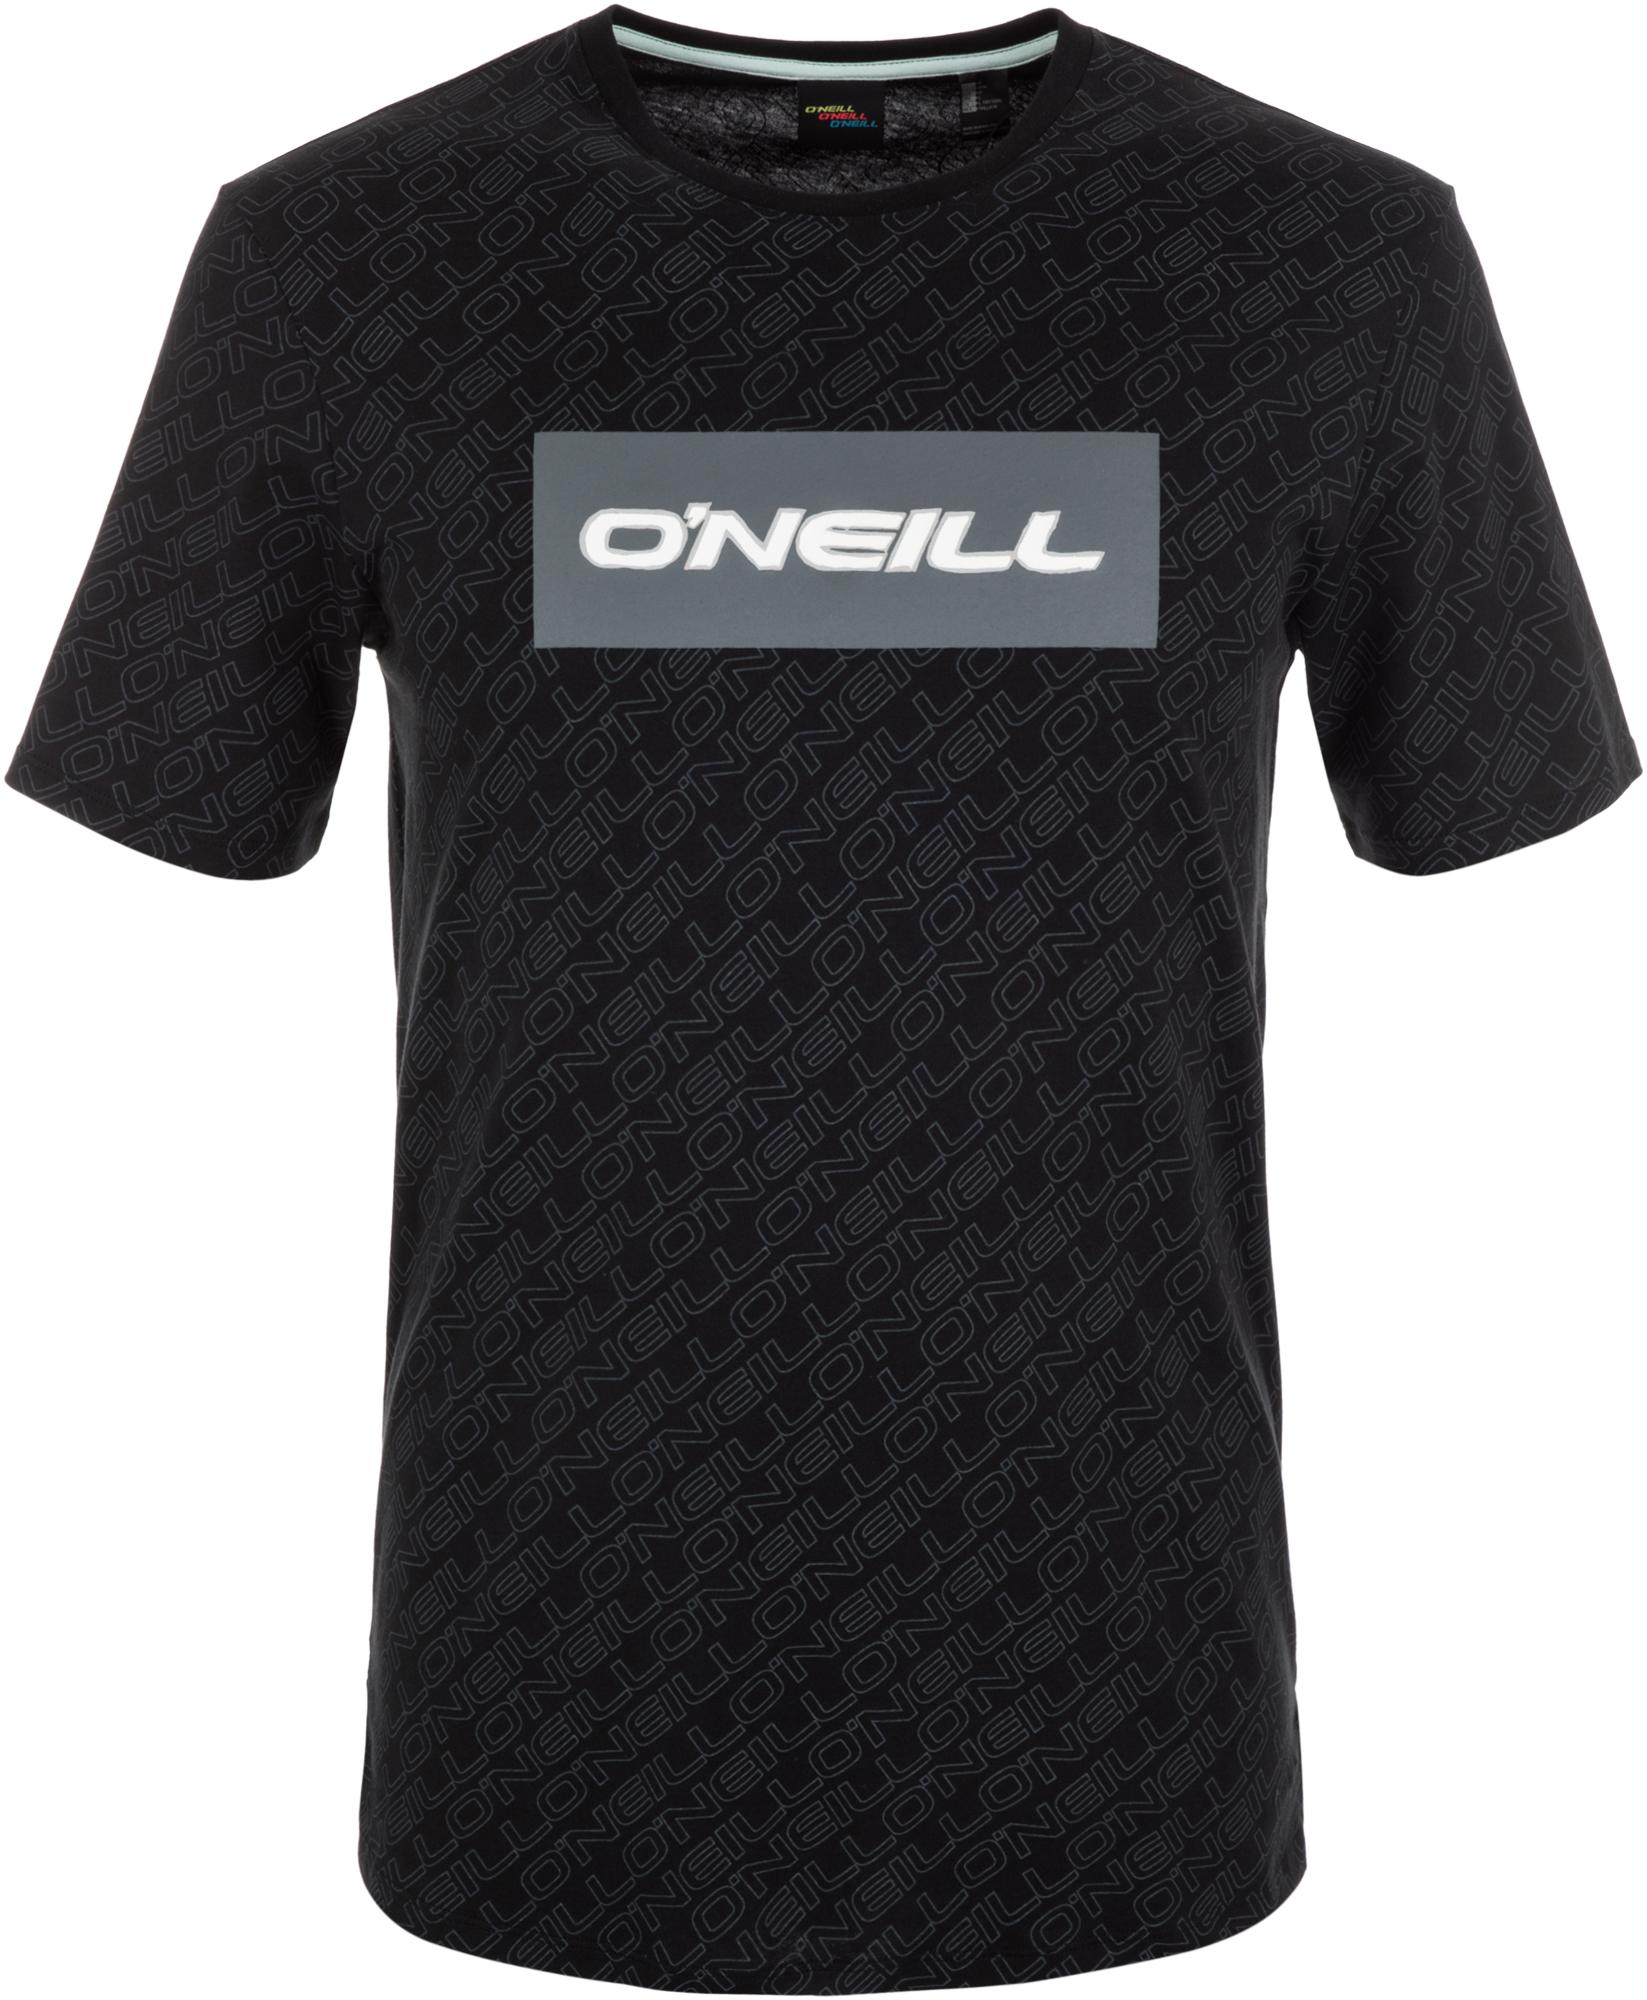 O'Neill Футболка мужская O'Neill Lm All Over Pring, размер 56-58